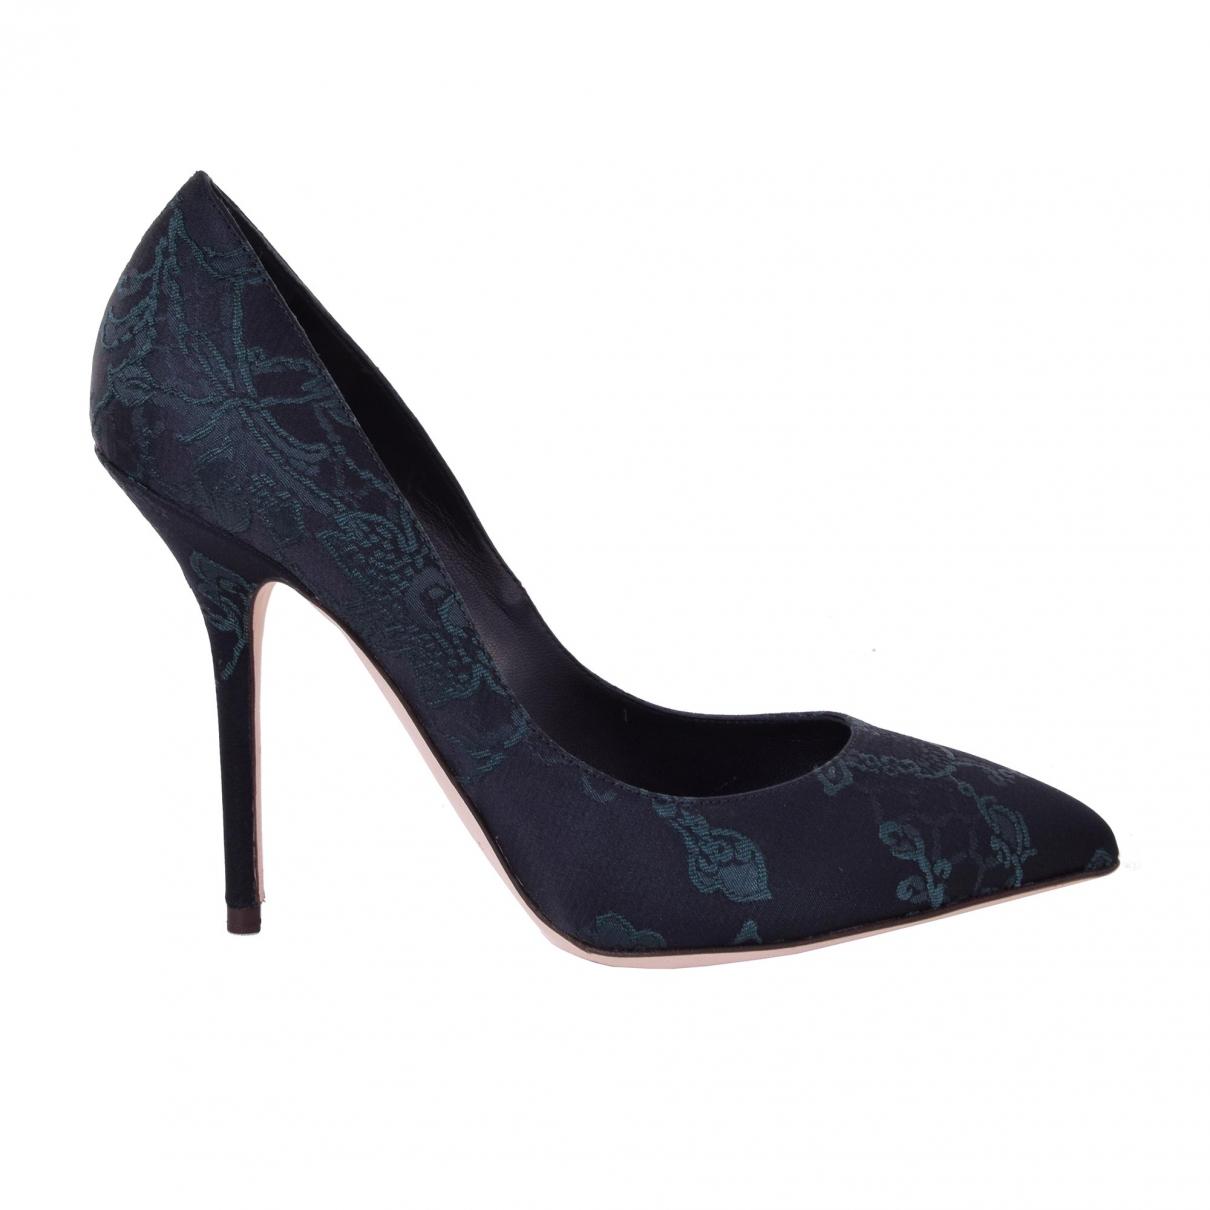 Dolce & Gabbana \N Black Cloth Heels for Women 39 EU